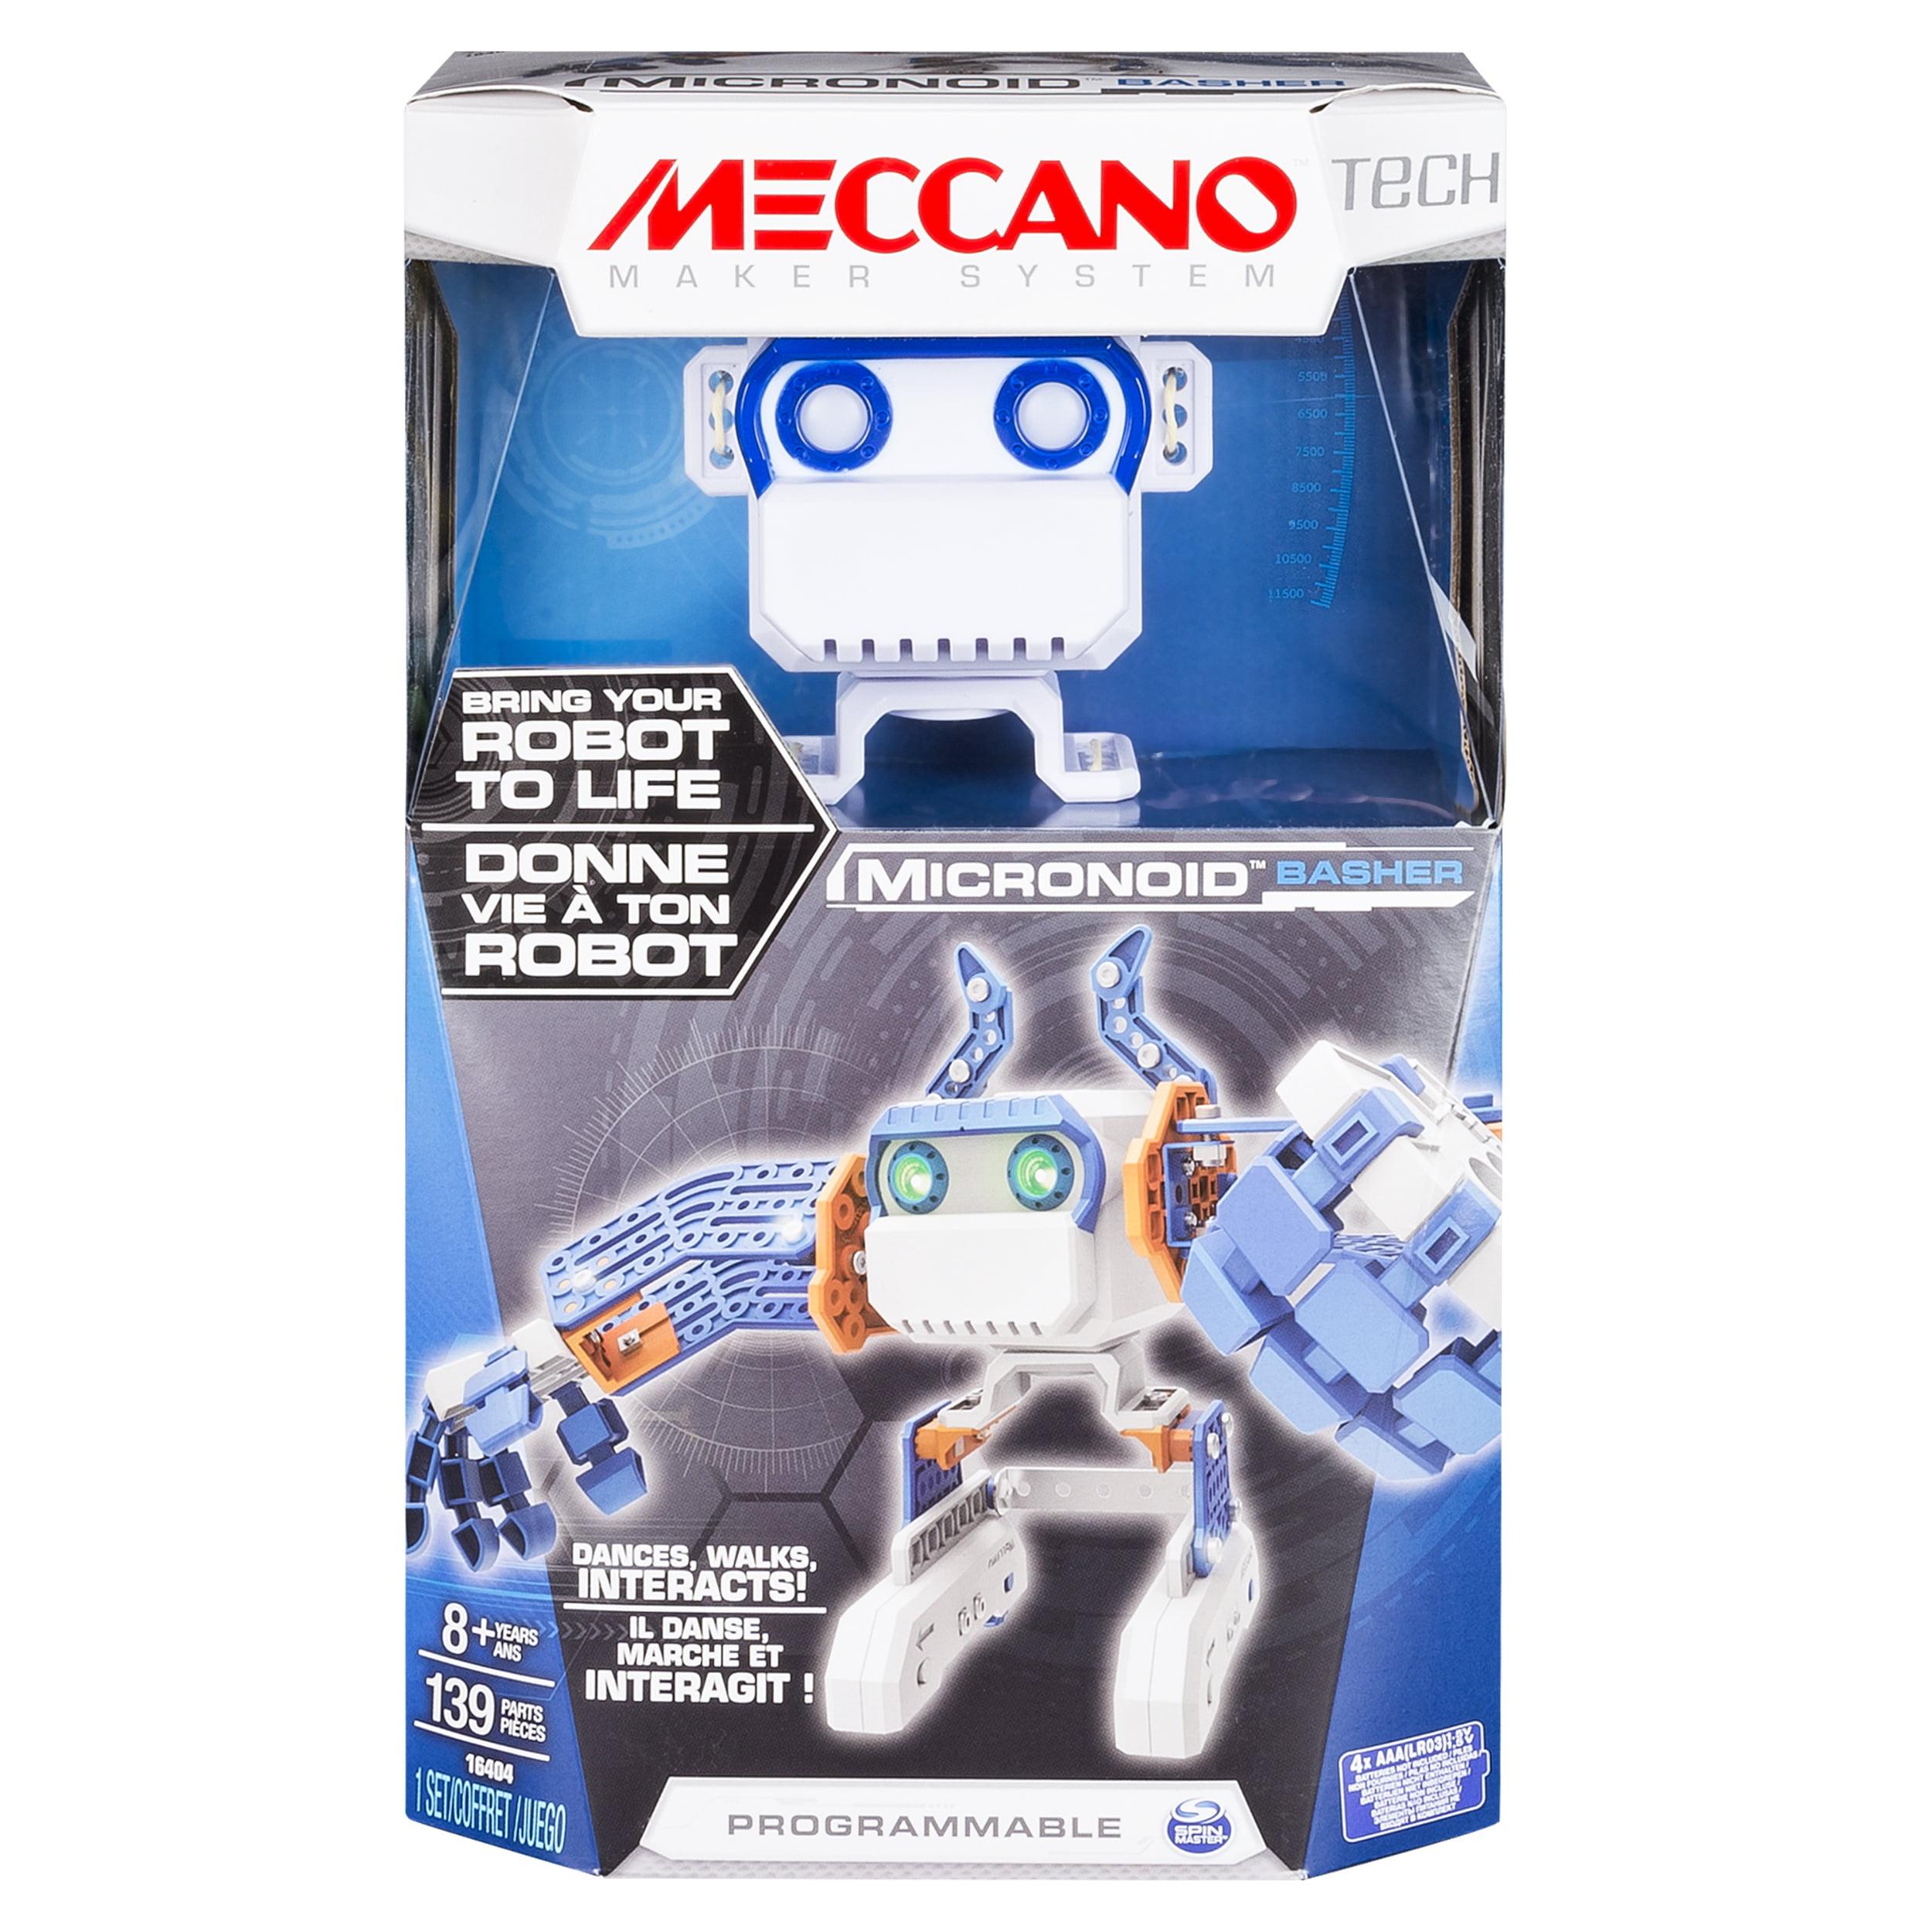 Meccano - MicroNoid - Blue Basher